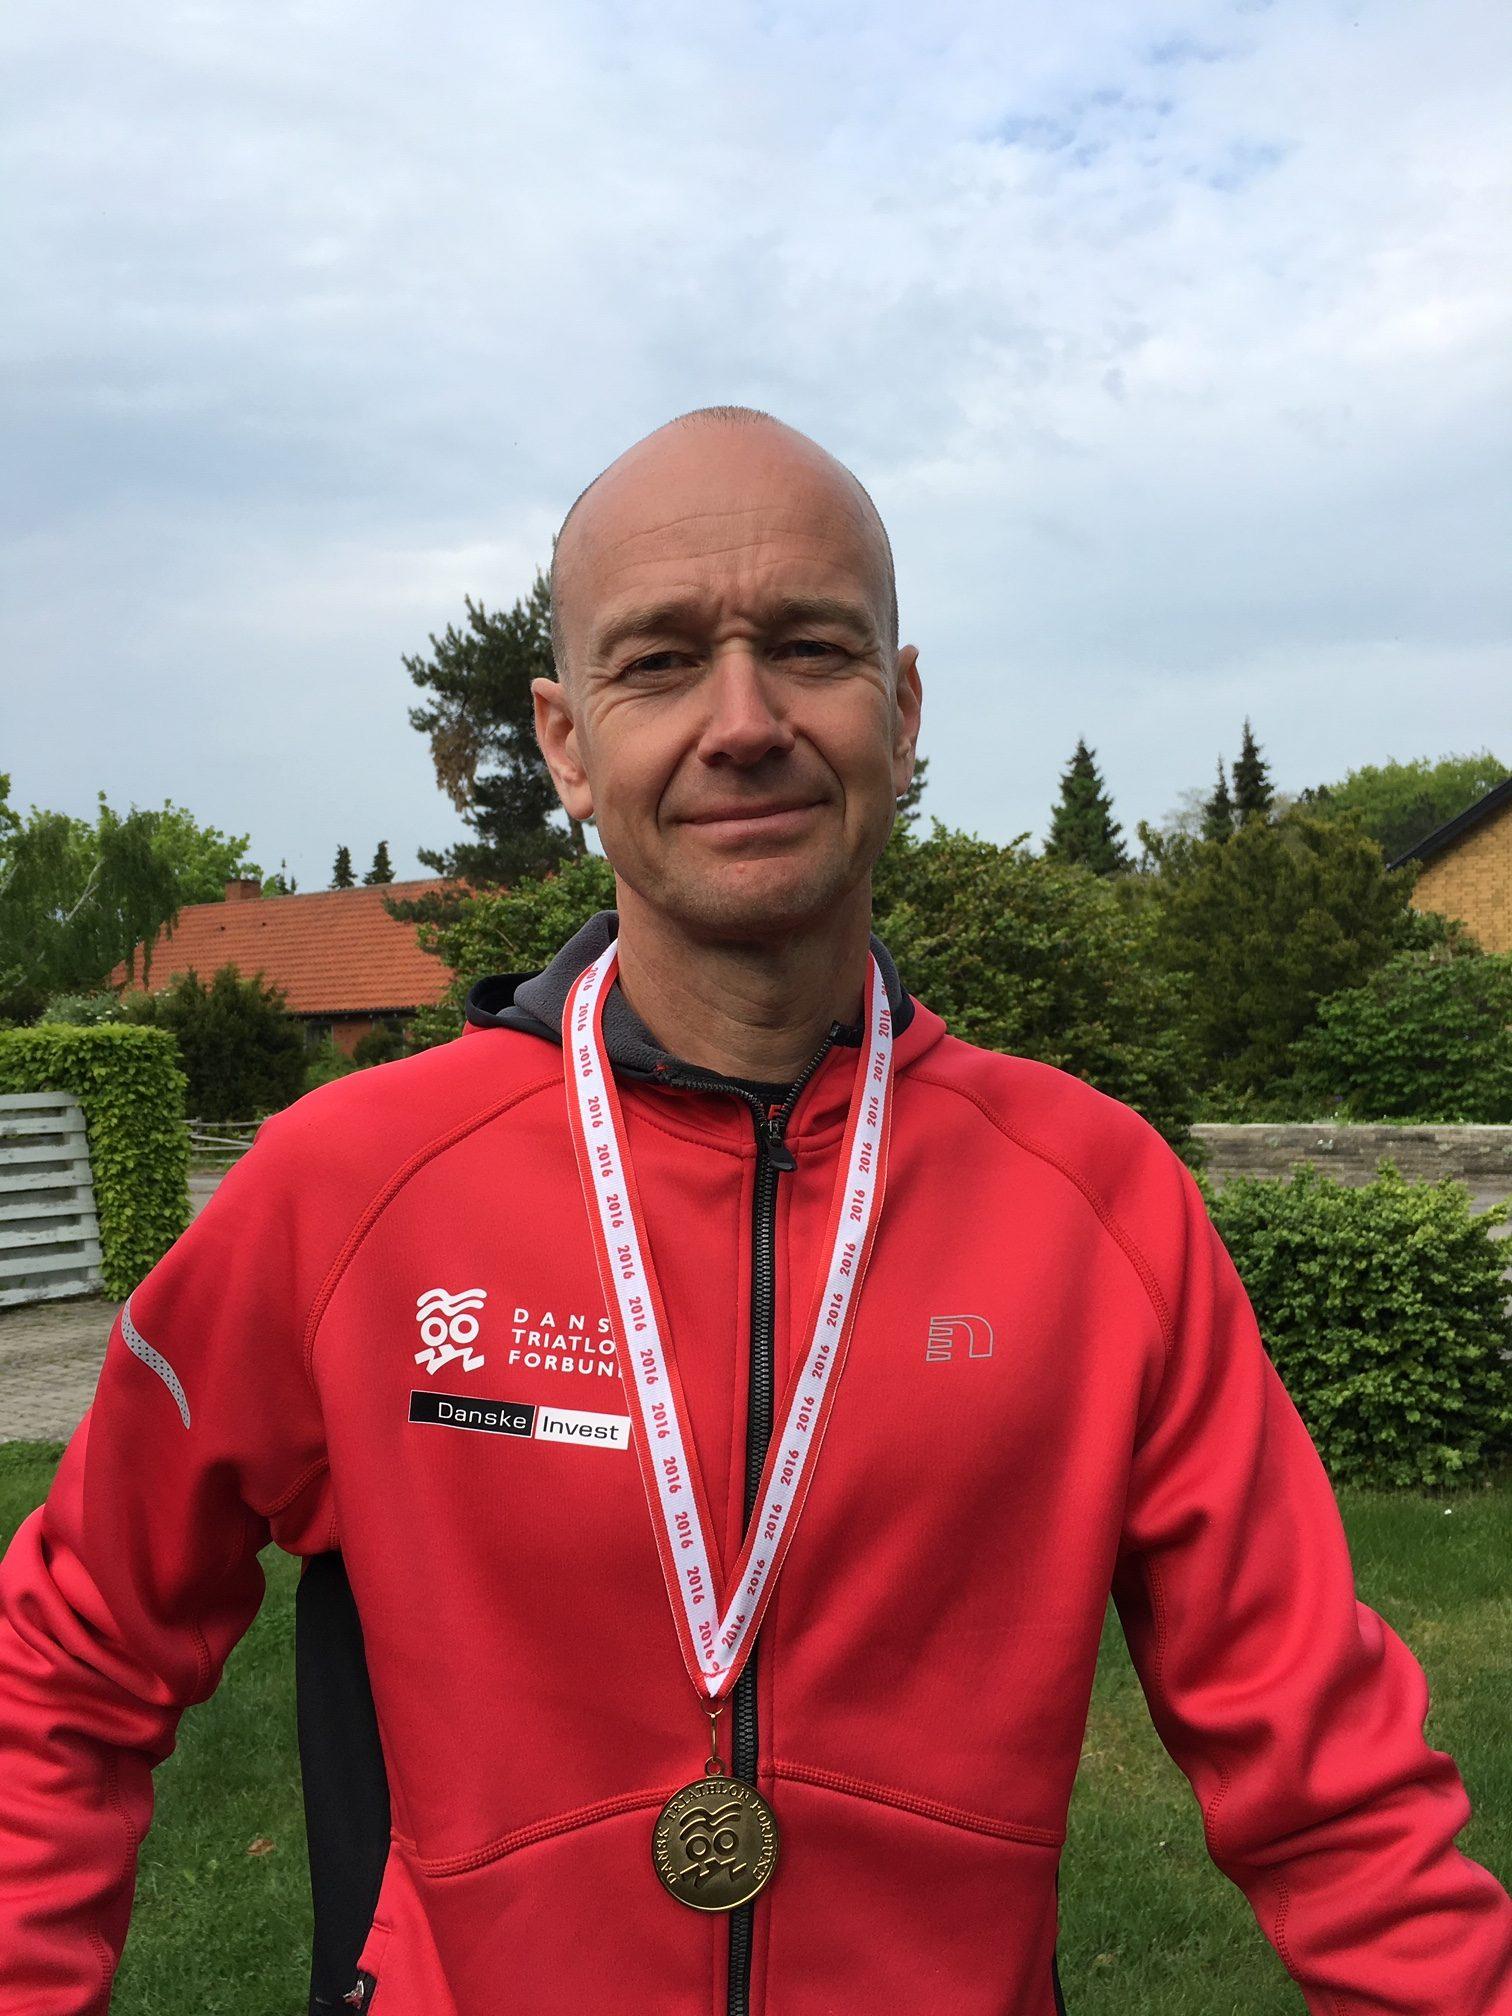 Jens Oluf Eriksen